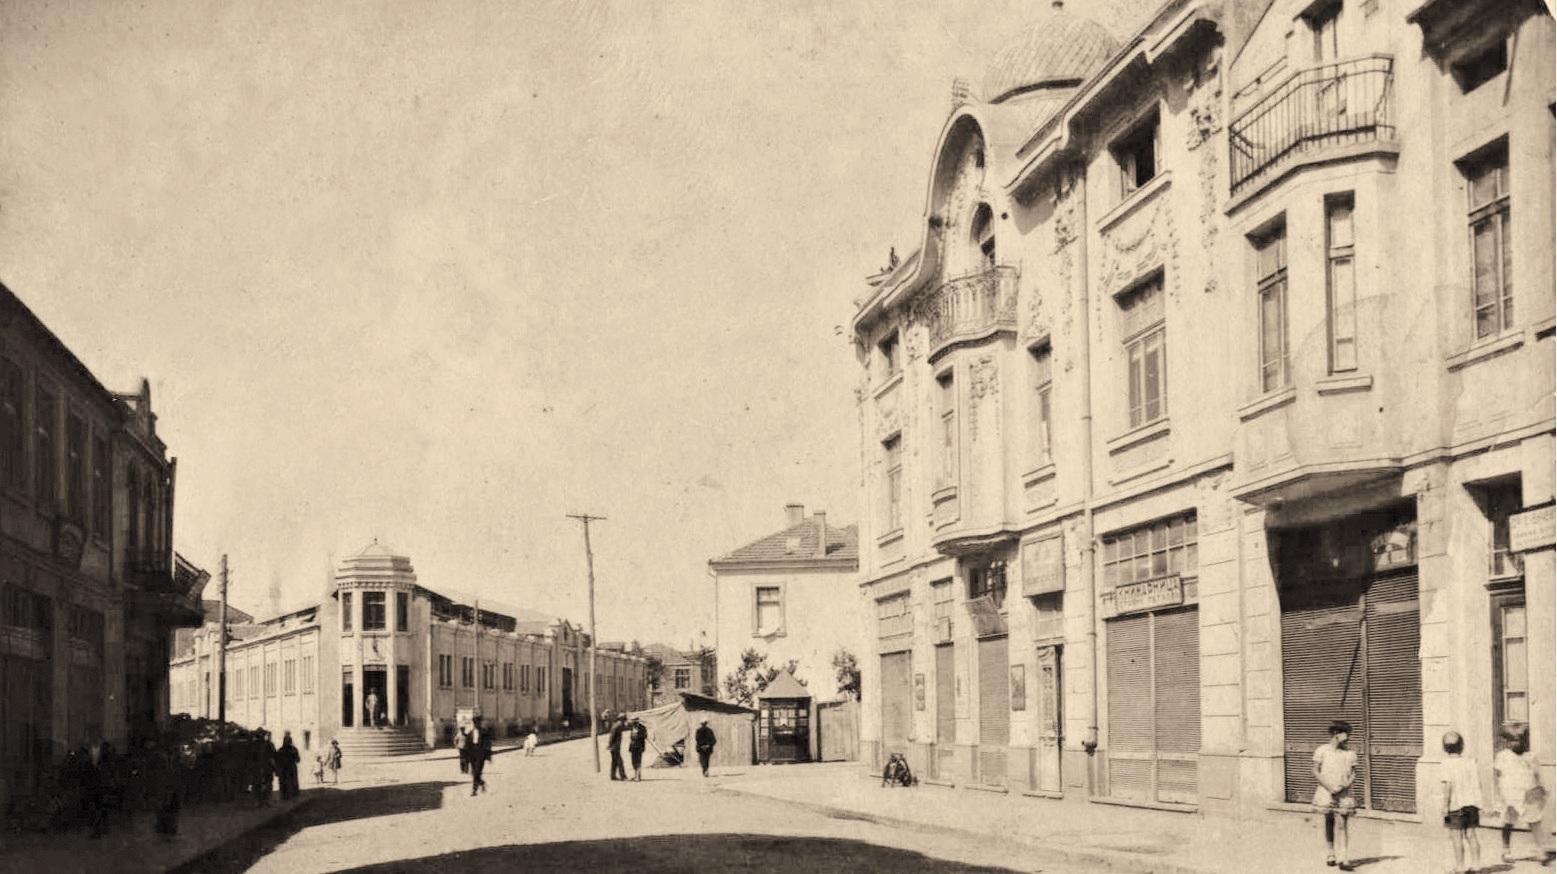 История на бургаските пазари: Емблематичните бургаски хали